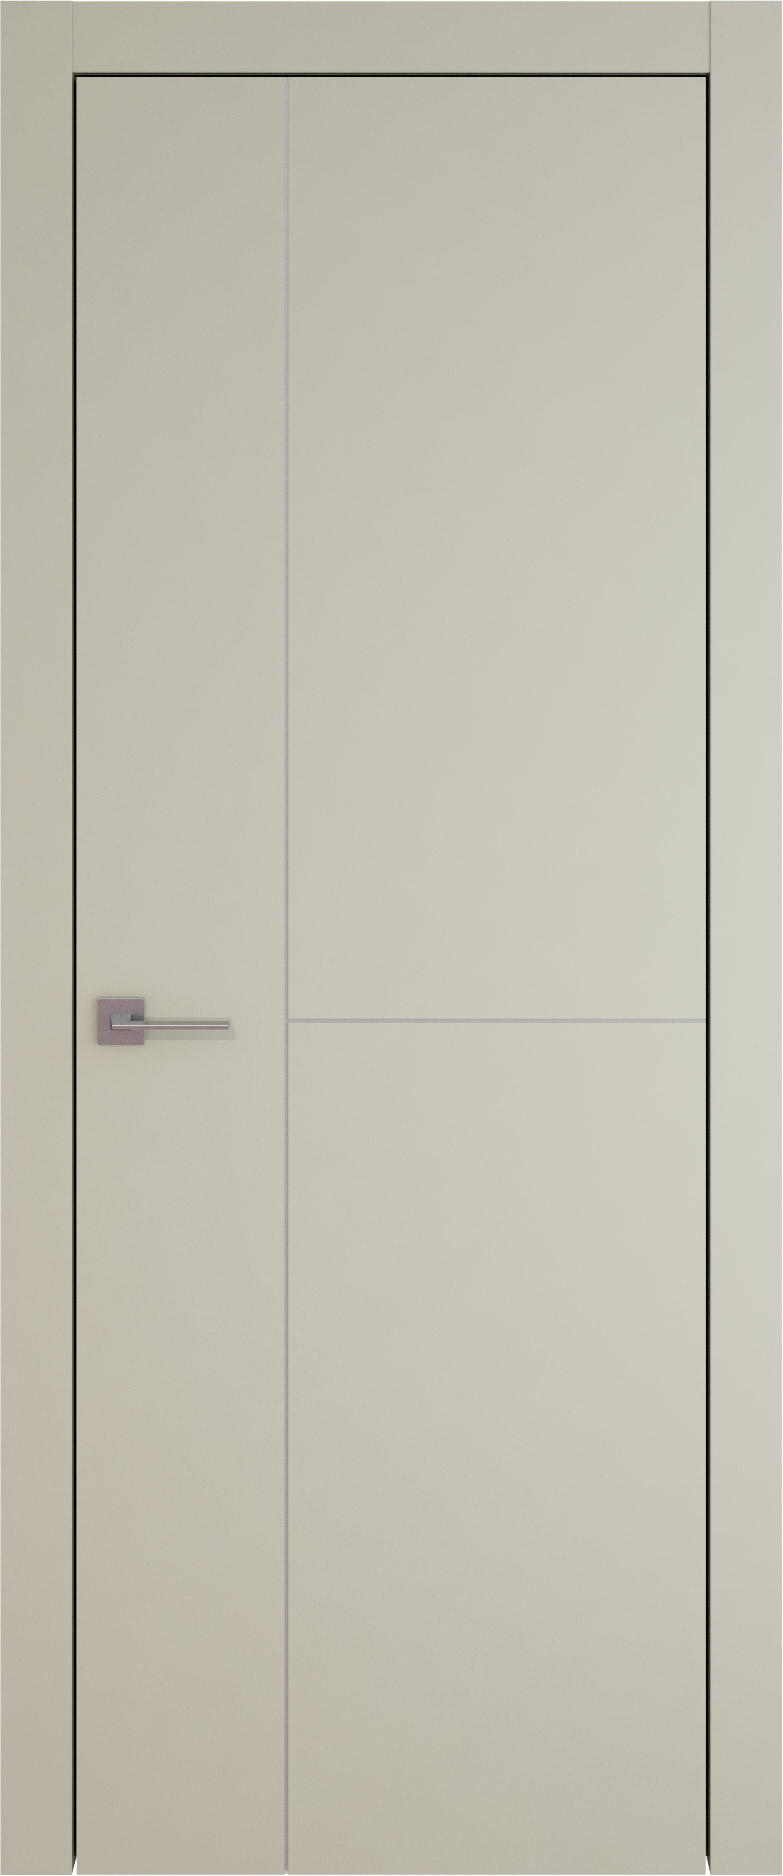 Tivoli Г-1 цвет - Серо-оливковая эмаль (RAL 7032) Без стекла (ДГ)